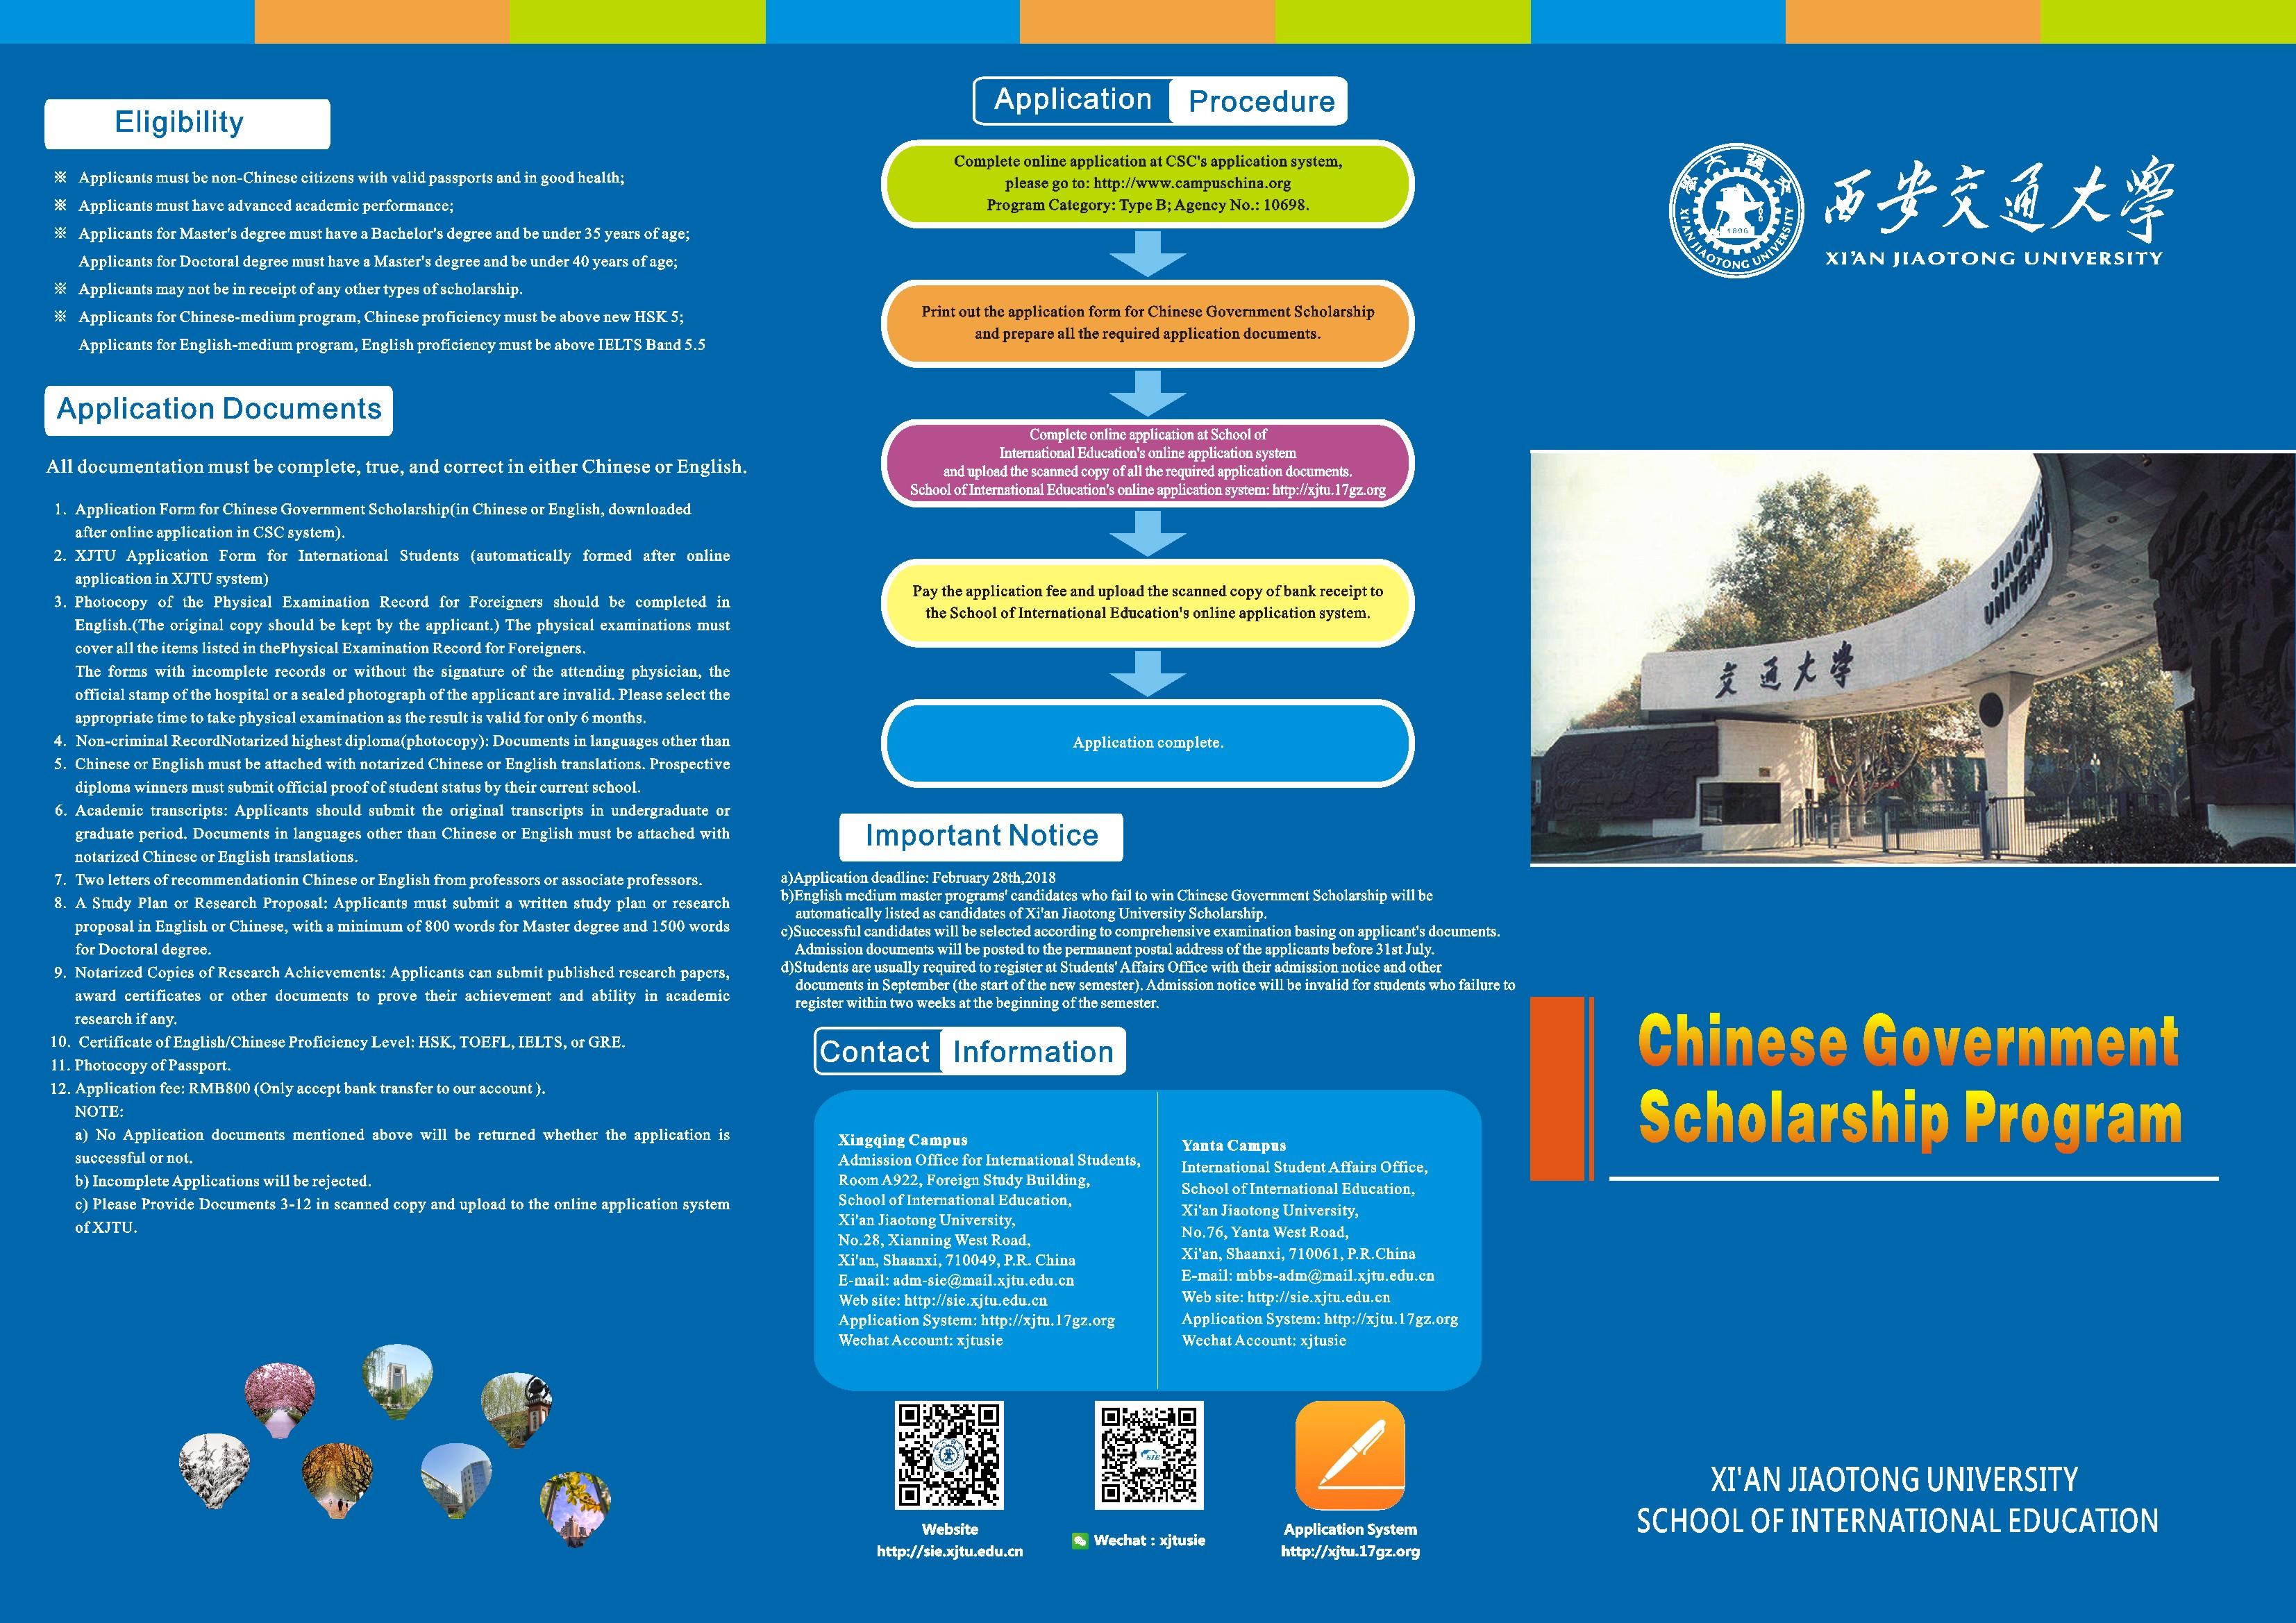 an online scholaship application system